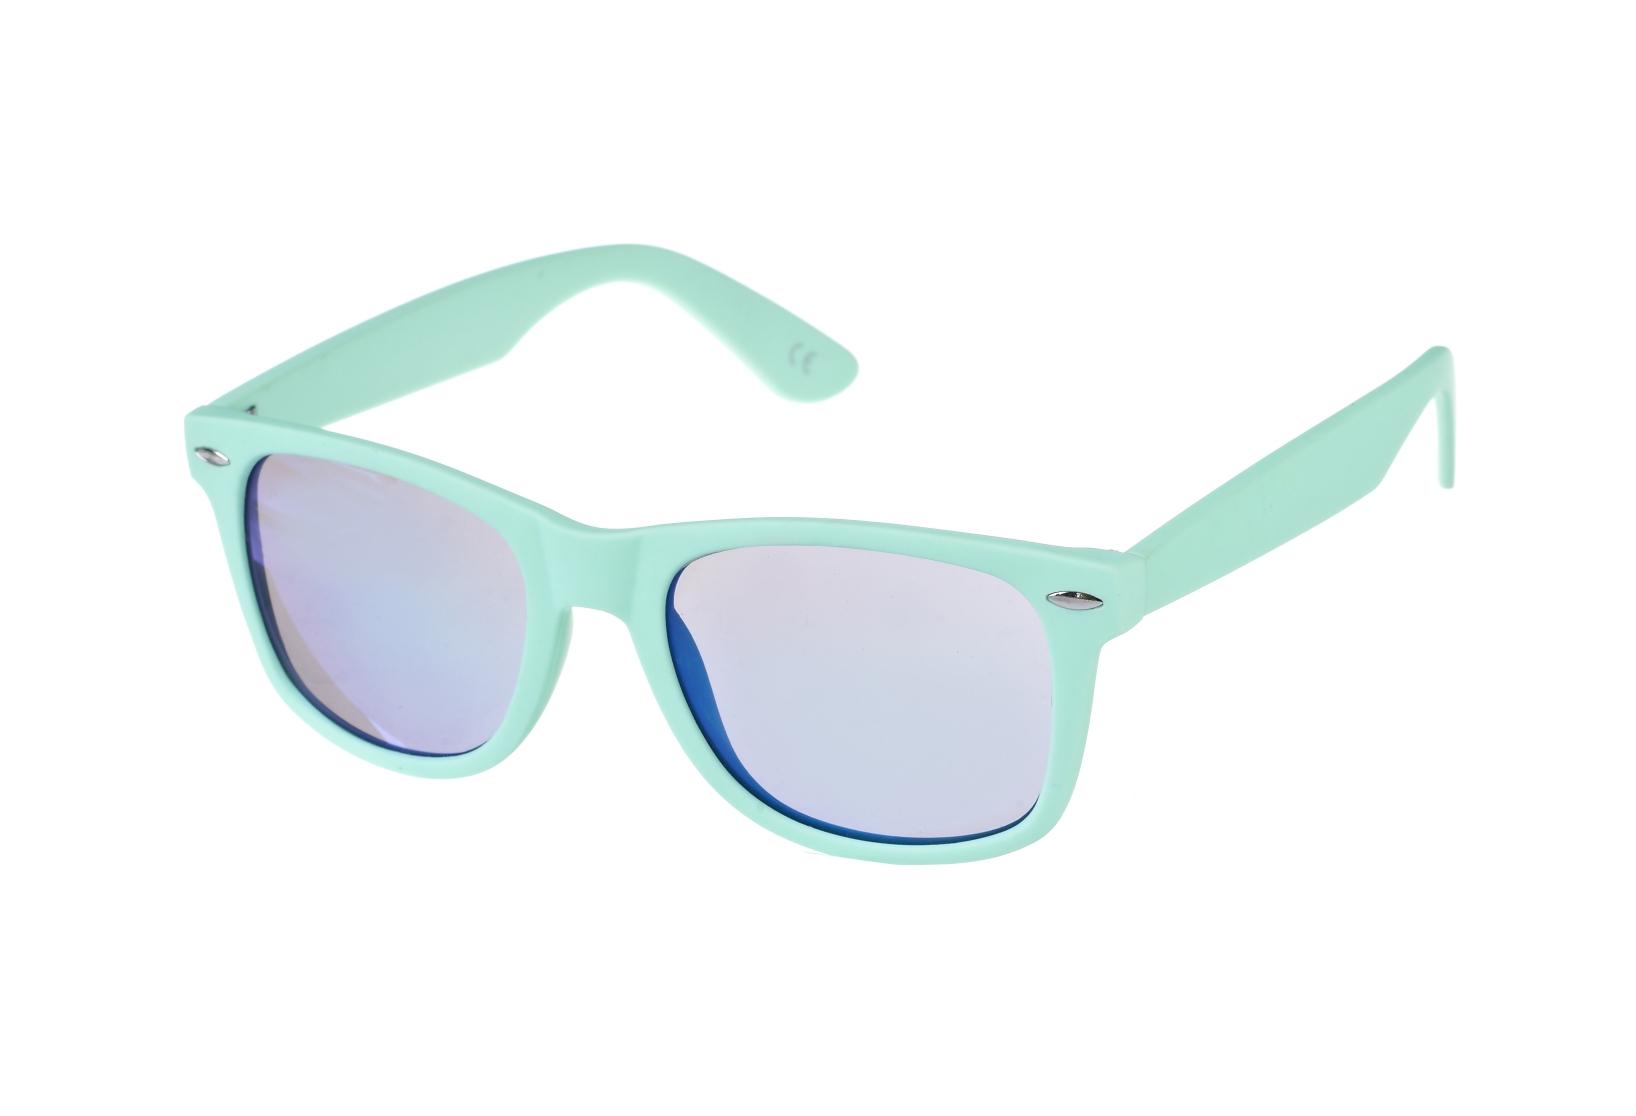 Light Blue Sunglasses _6, 7.99 Euro, 12.90 CHF, 31.90 PLN